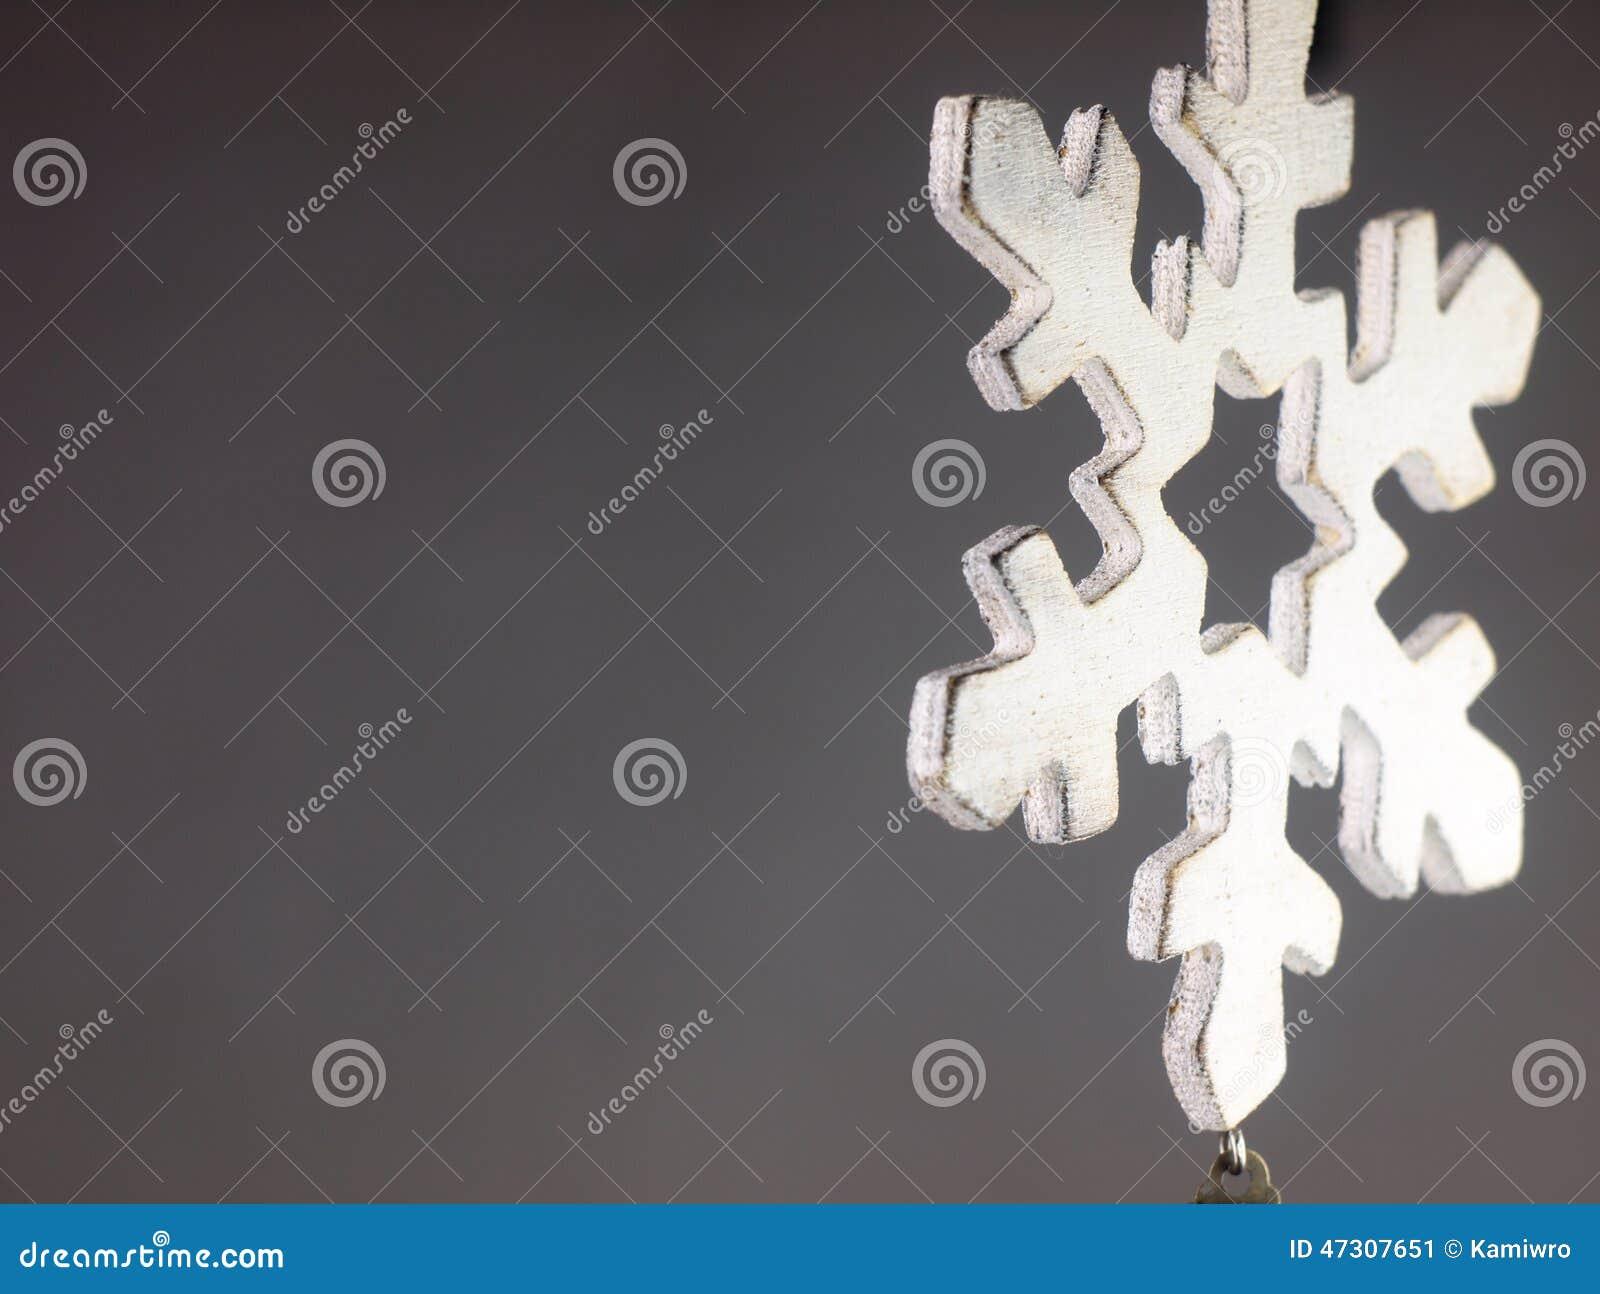 Wooden Christmas Ornament Big Snowflake Stock Image Image Of